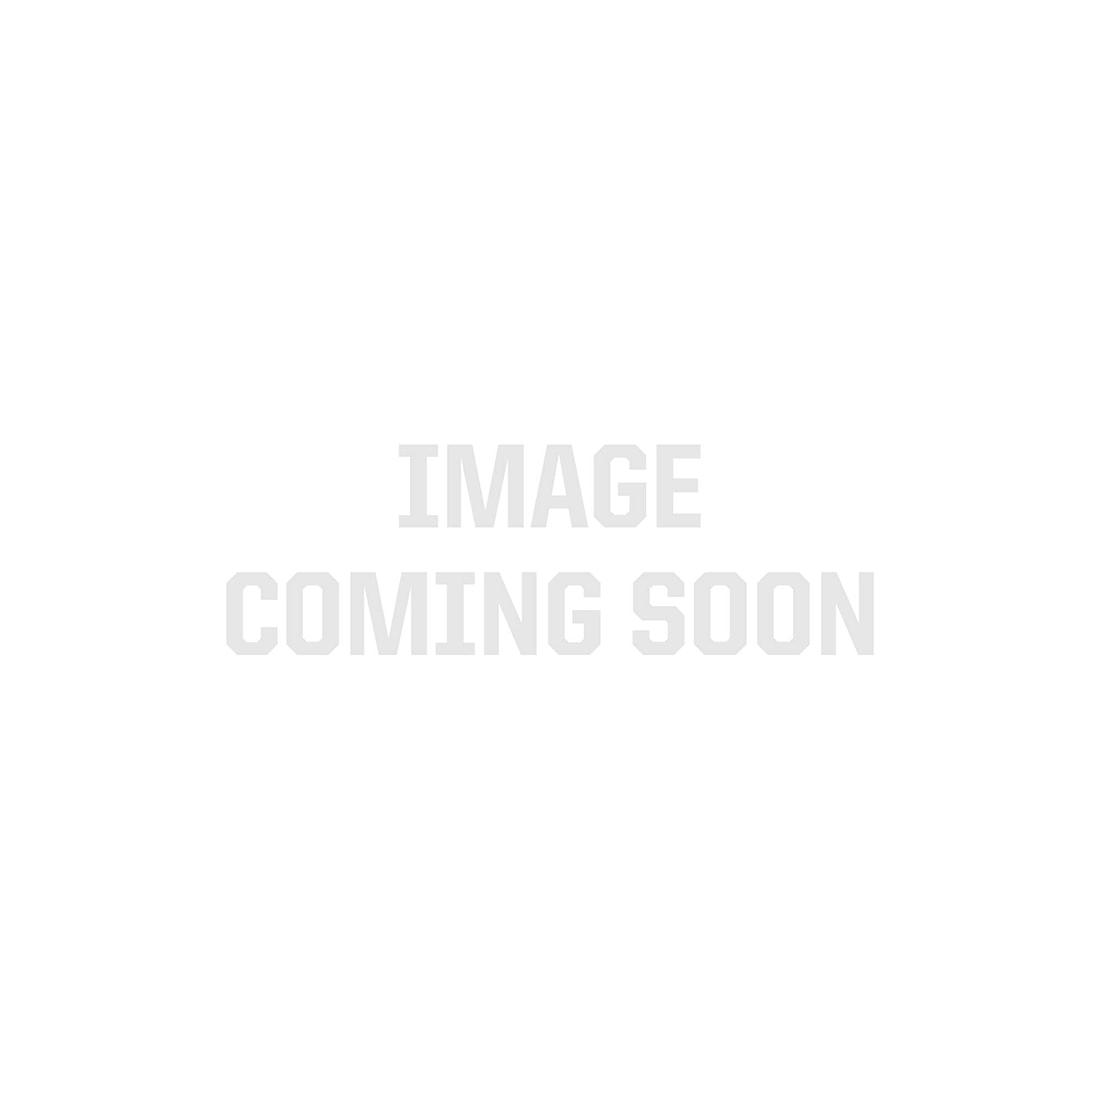 Klus EX-ALU Aluminum Channel for Edge Lighting (Anodized)